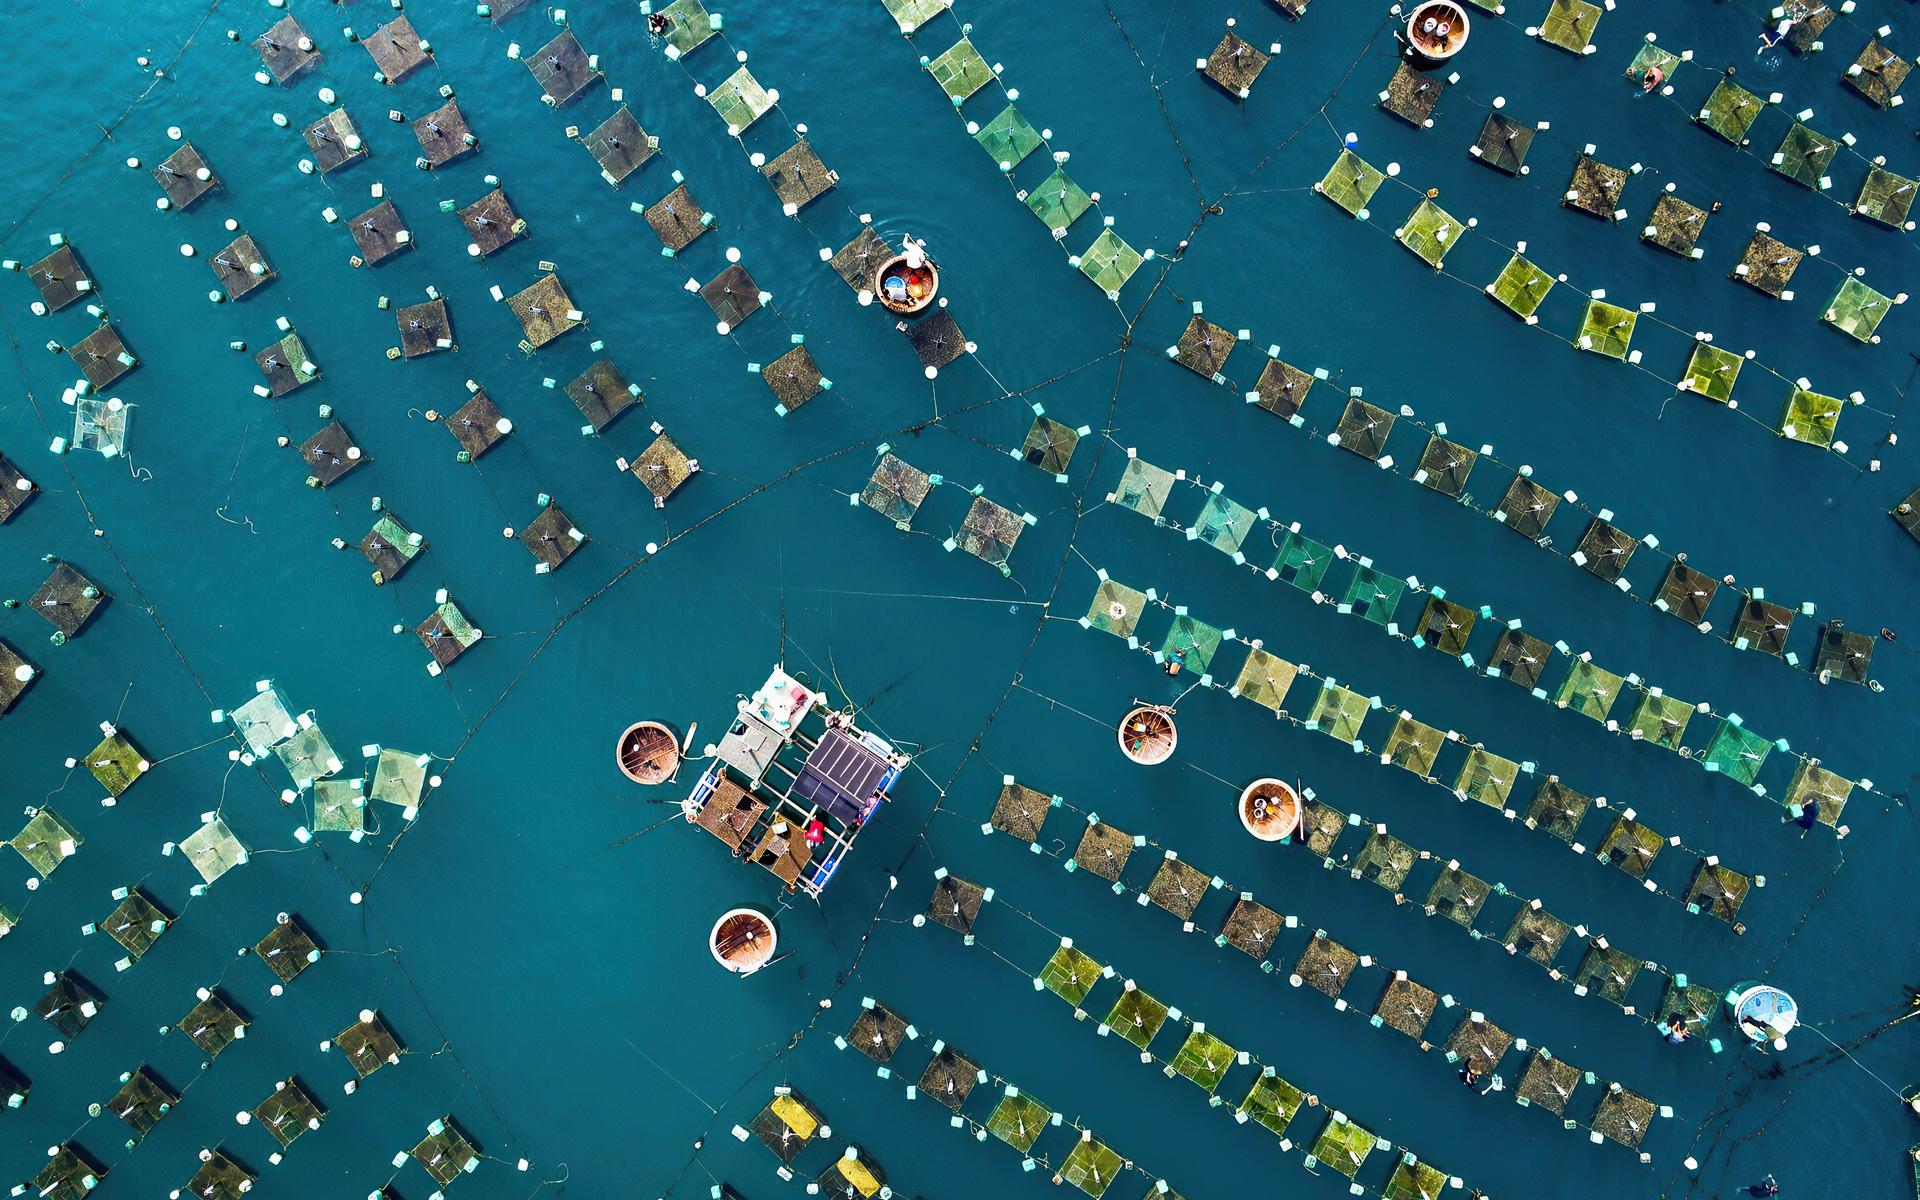 docks-top-view-4k-u0.jpg